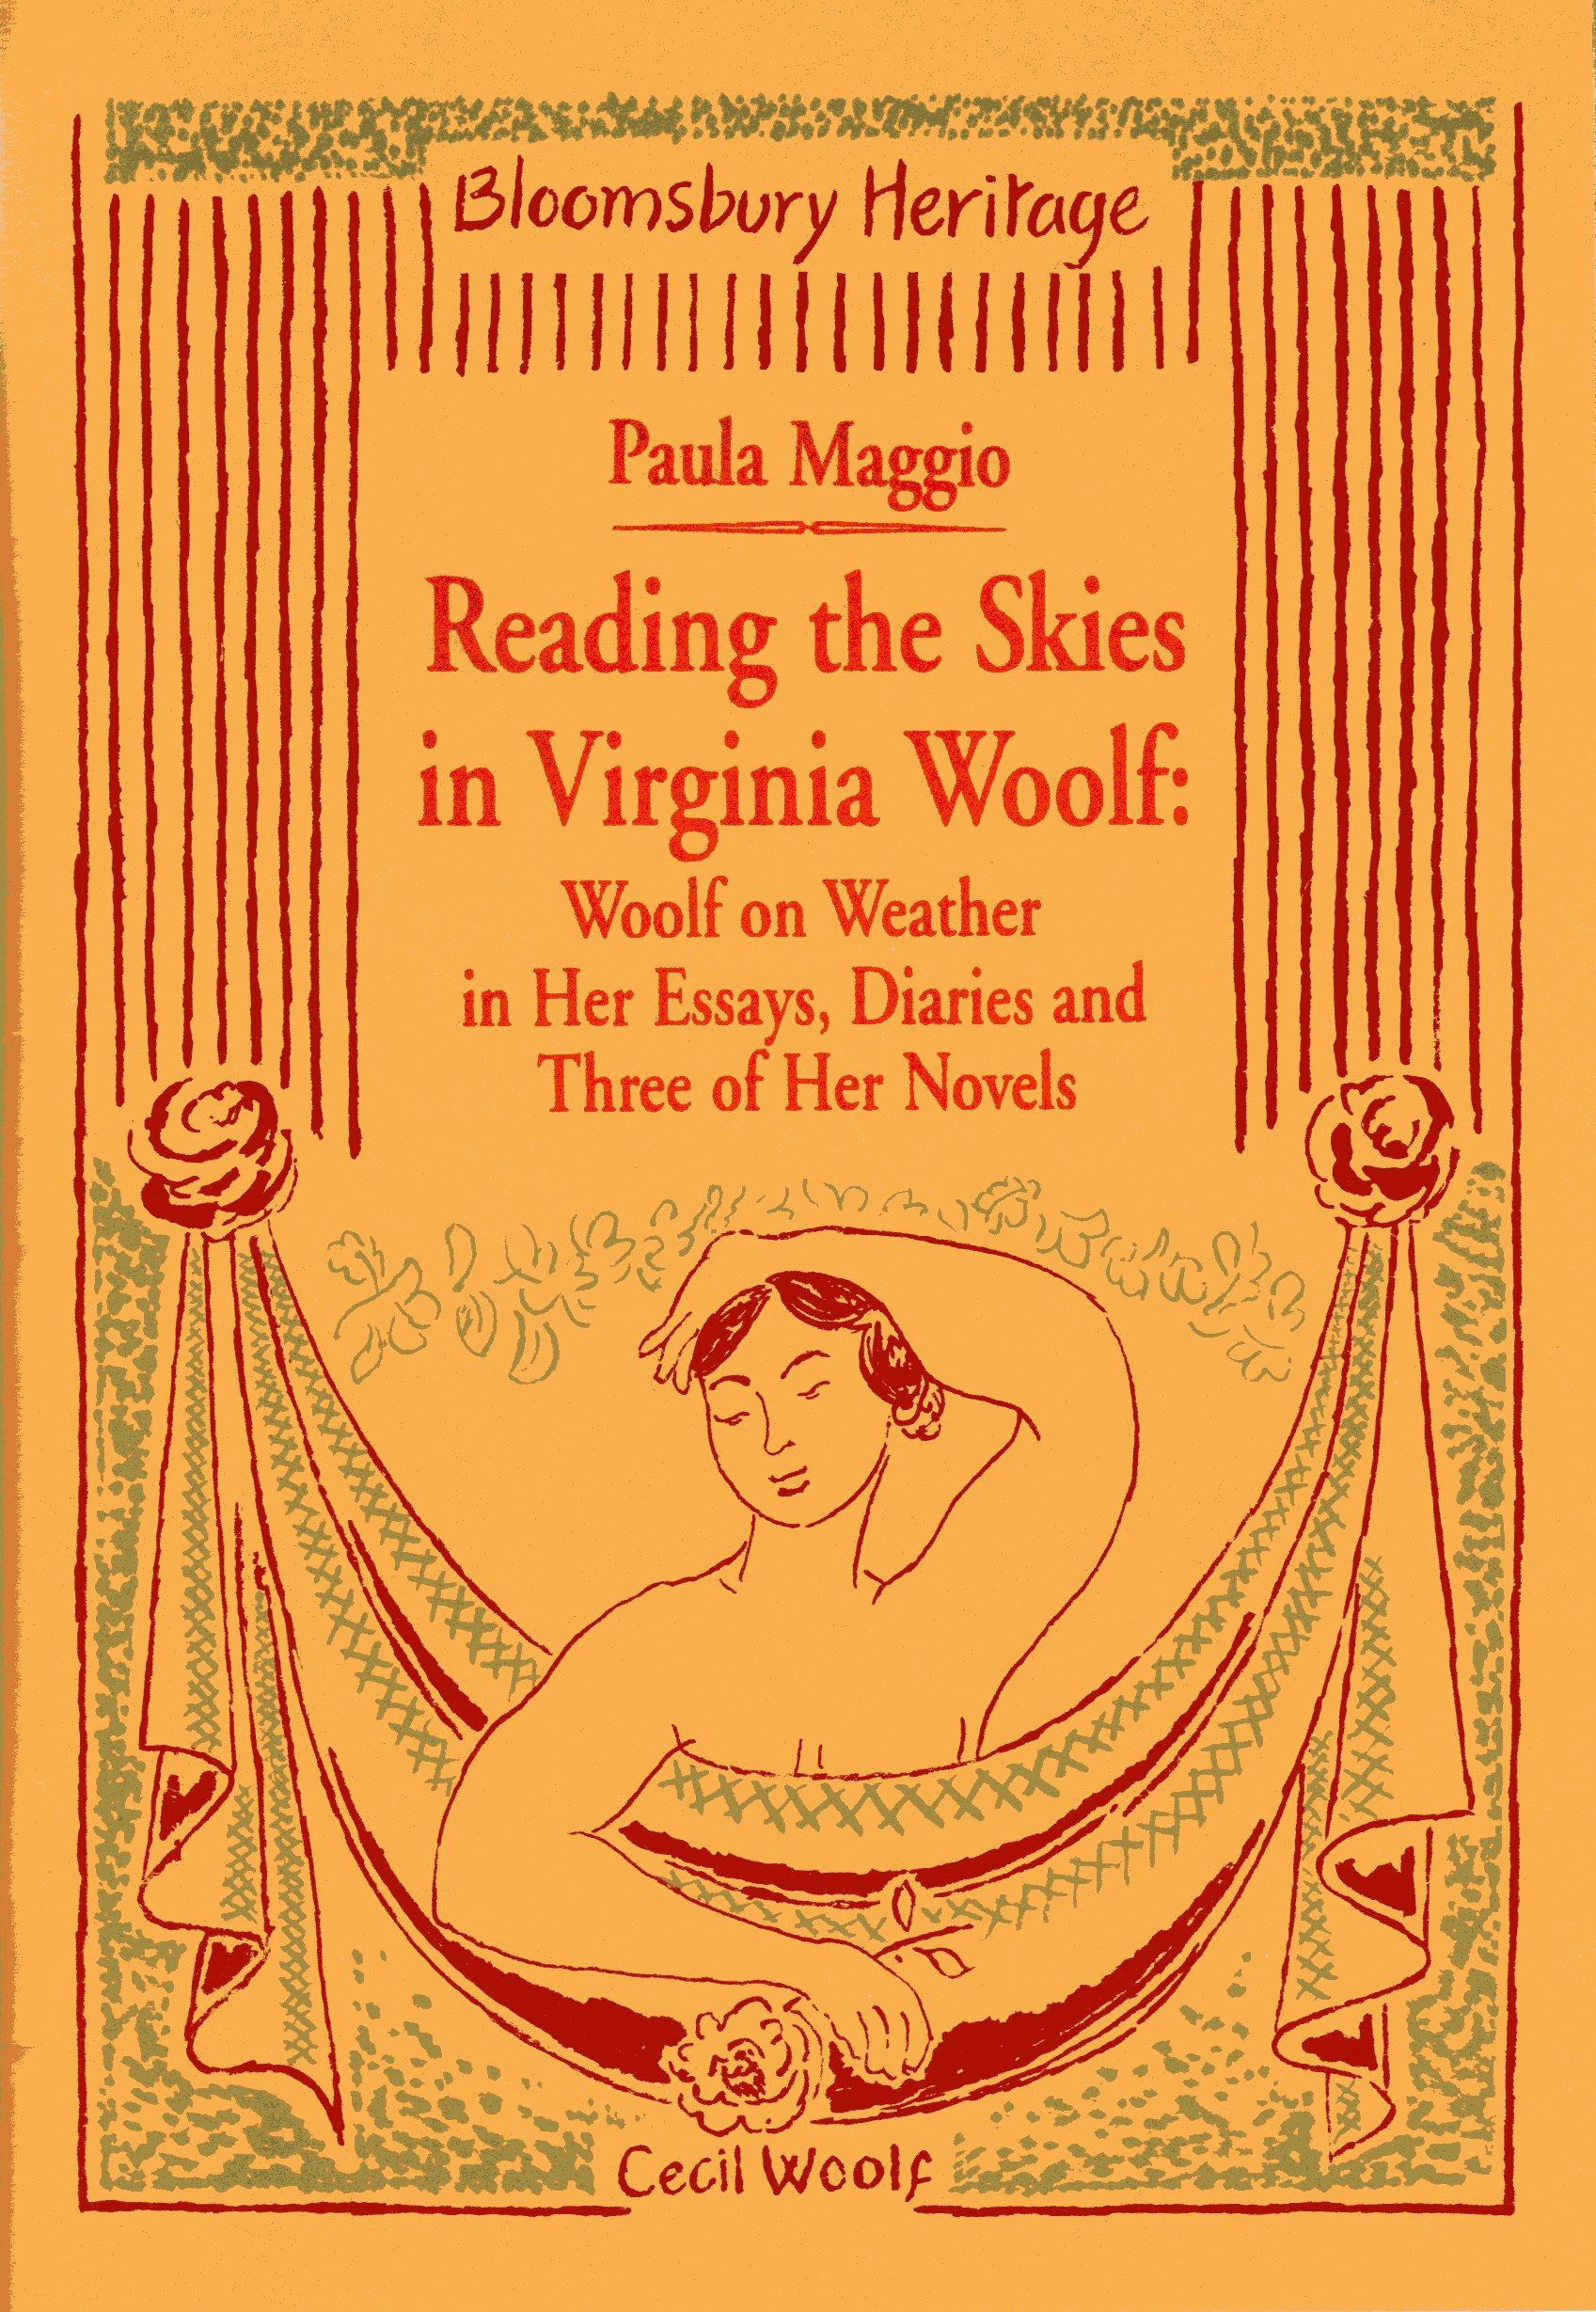 009 Reading The Skies Color016 Essay Example Virginia Woolf Unusual Essays Online Modern Analysis On Self Full